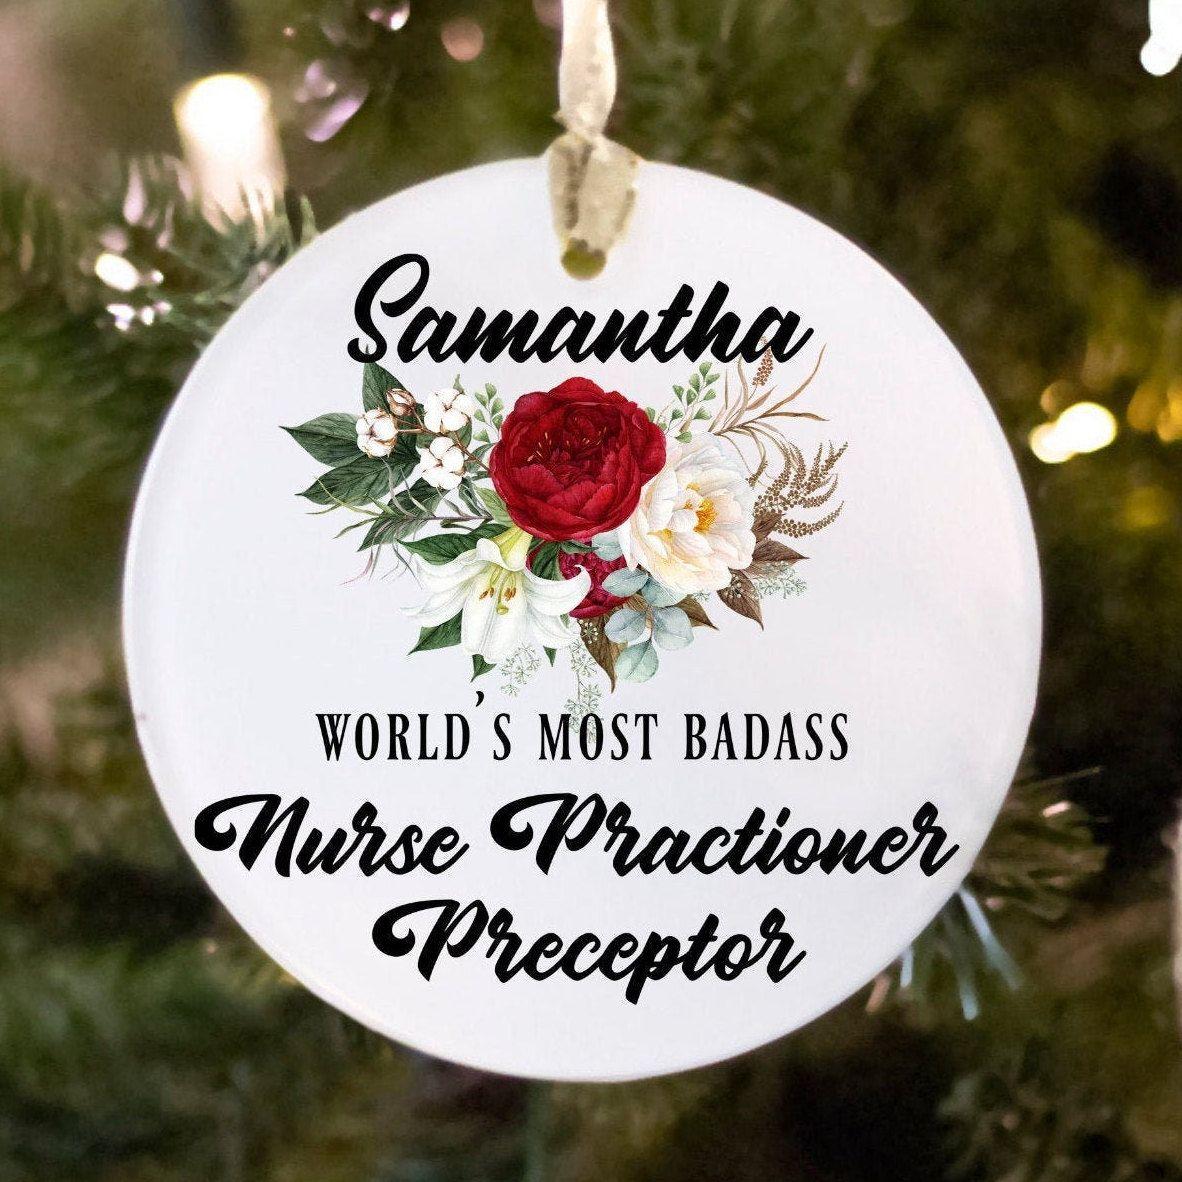 Nurse practitioner preceptor ornament gift for women